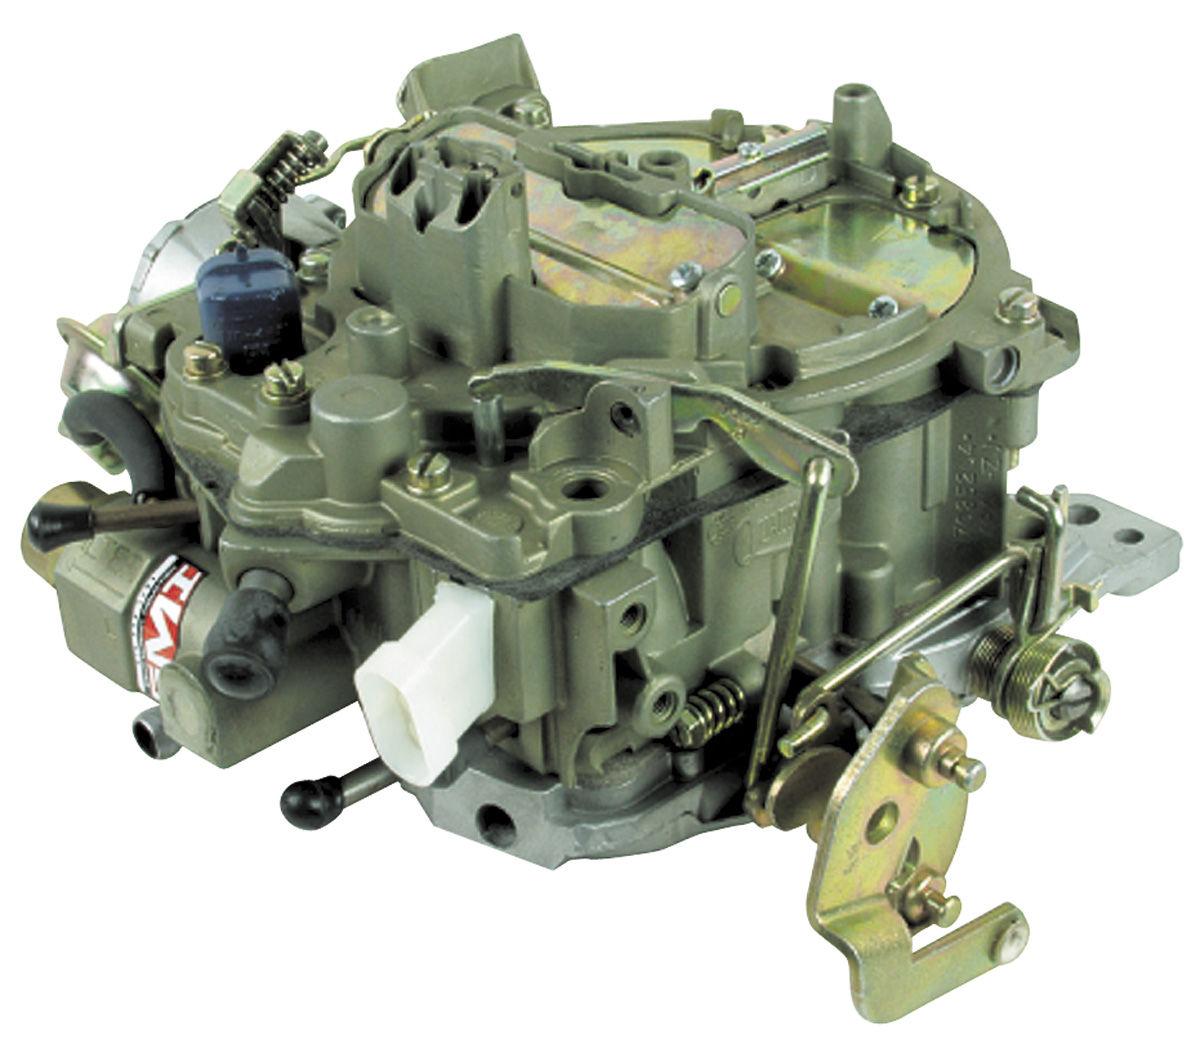 Photo of Carburetor, Stage I & II Electronic Quadrajet Small Block, stage II, 750 CFM